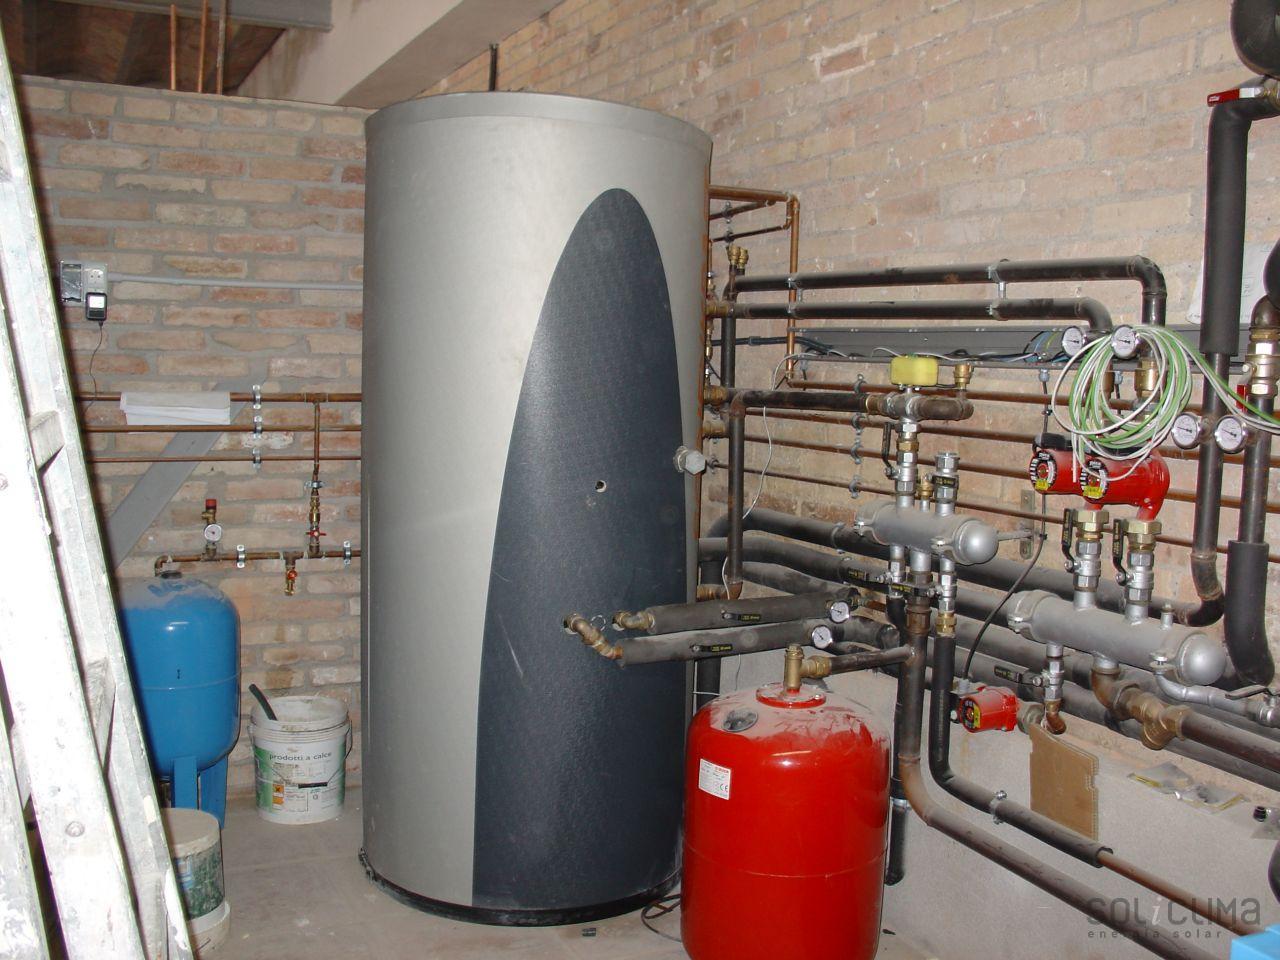 Instalacion energia solar fotovoltaica calefaccion for Bomba calefaccion gasoil